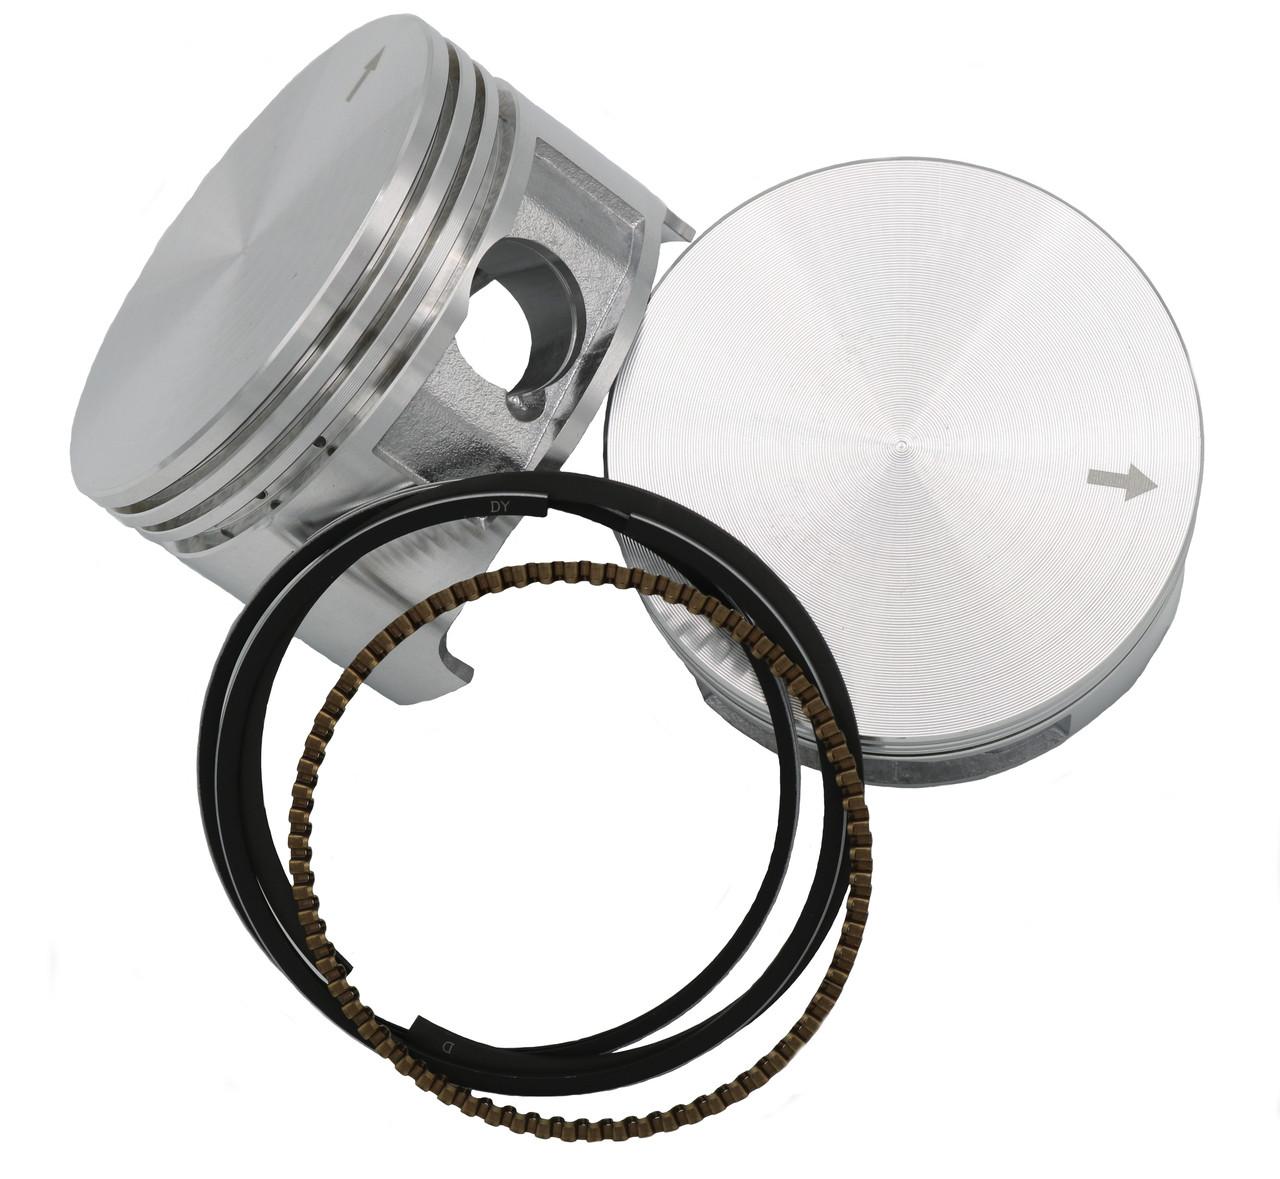 DJ-1285PH2 STD Predator Hemi Flat Top Piston and Rings (NO WP OR CLIPS)